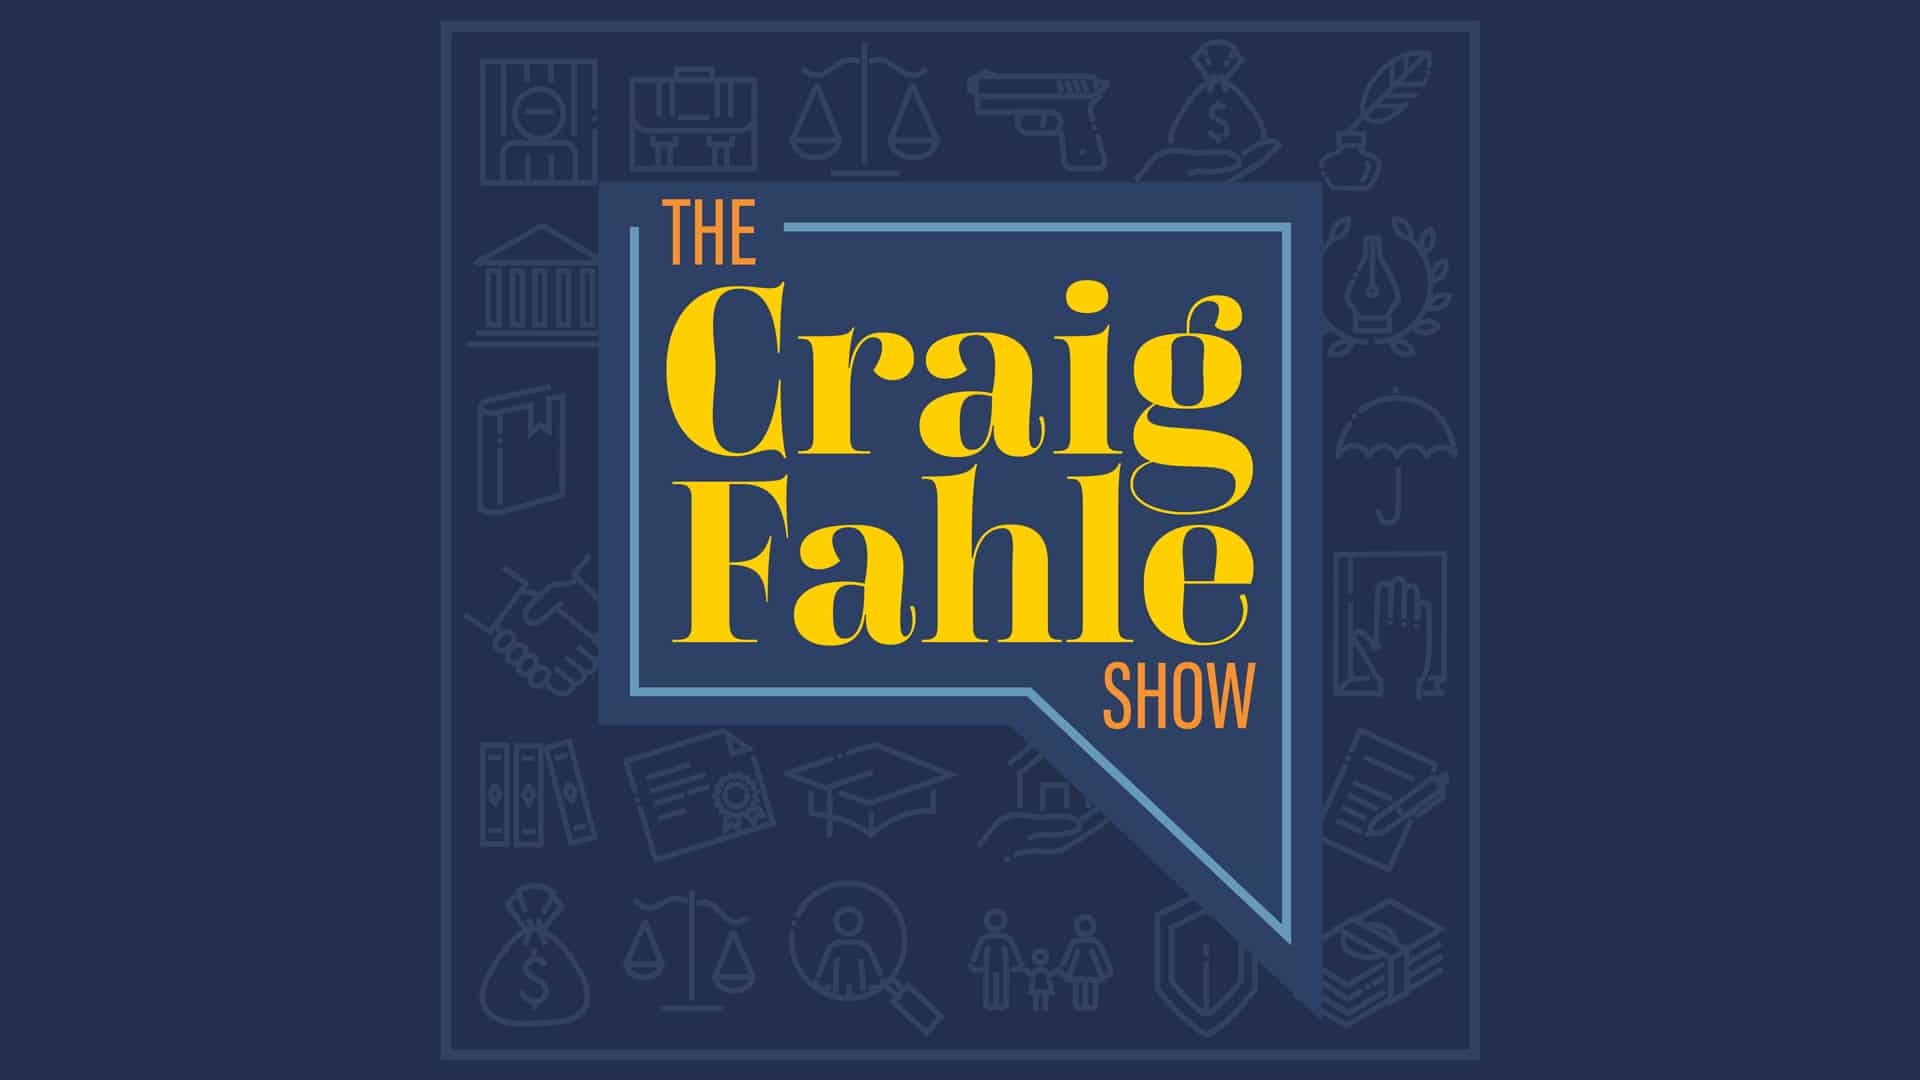 The Craig Fahle Show